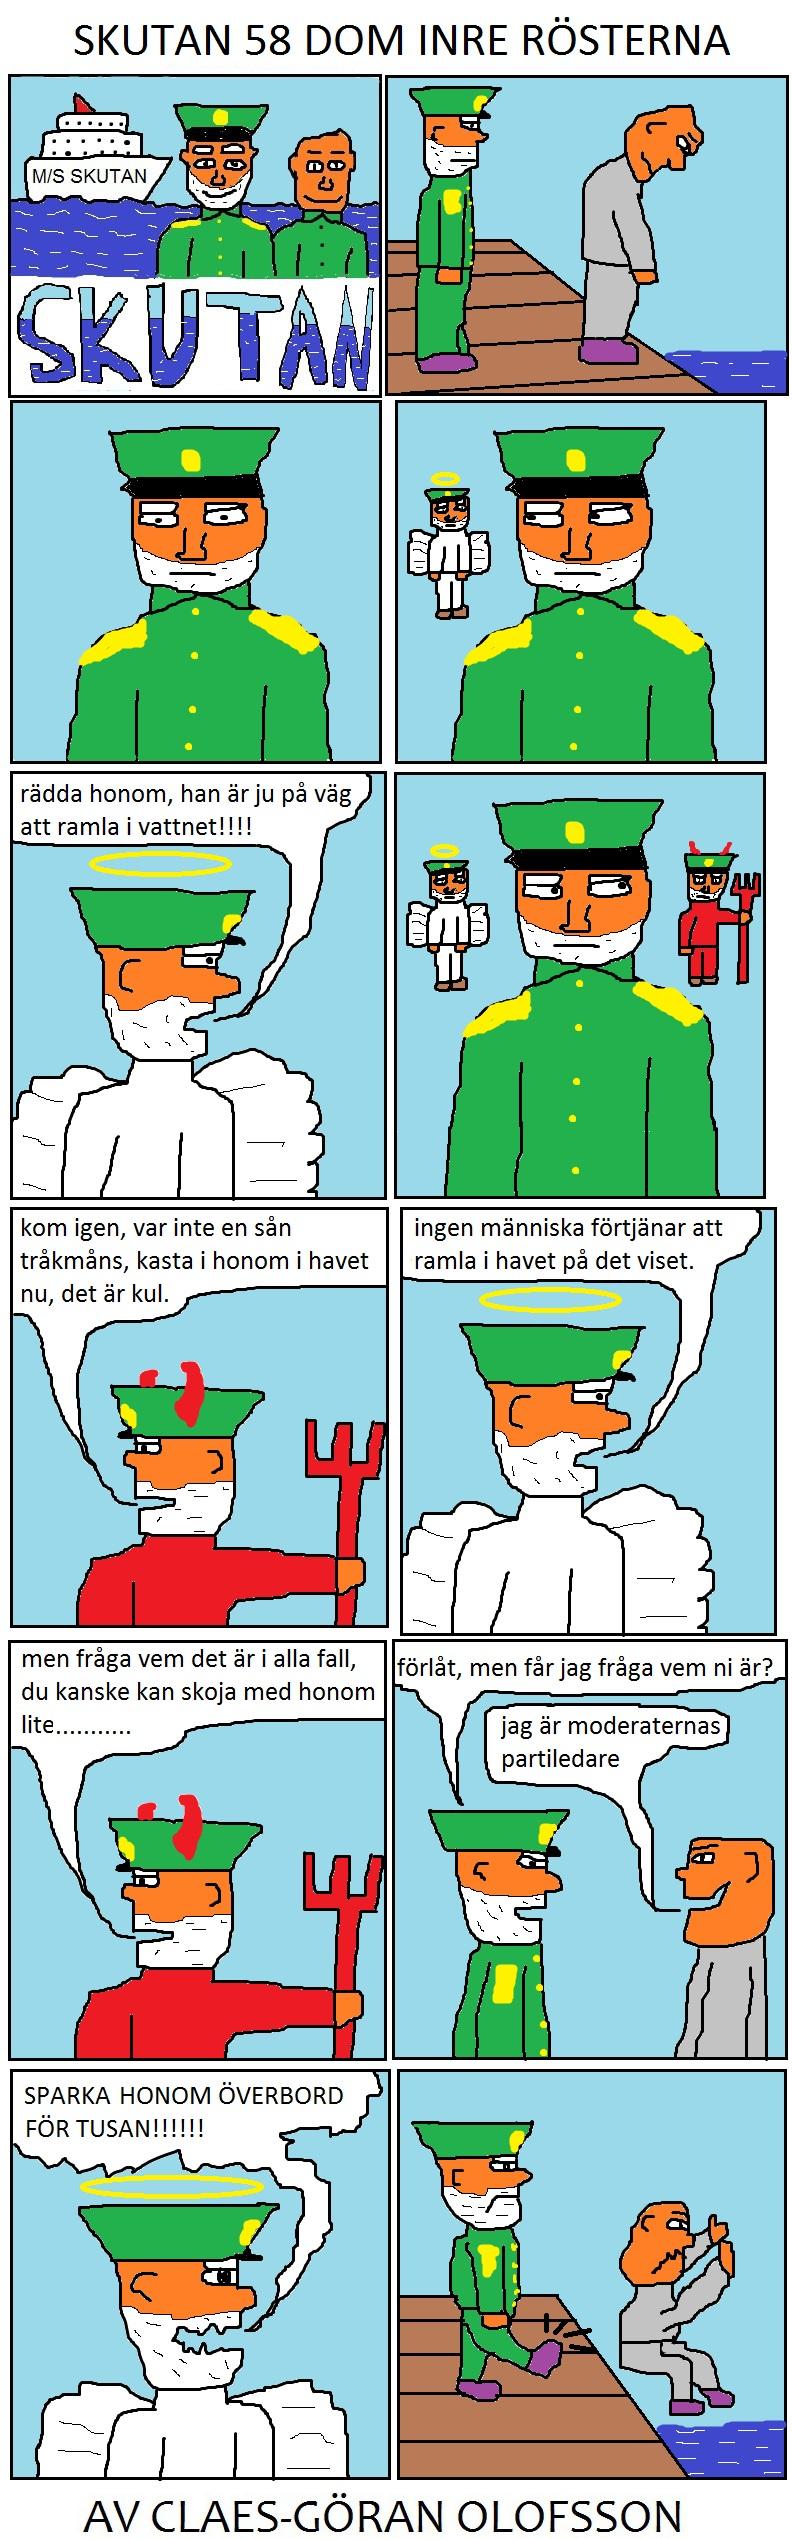 SKUTAN 58 DOM INRE RÖSTERNA